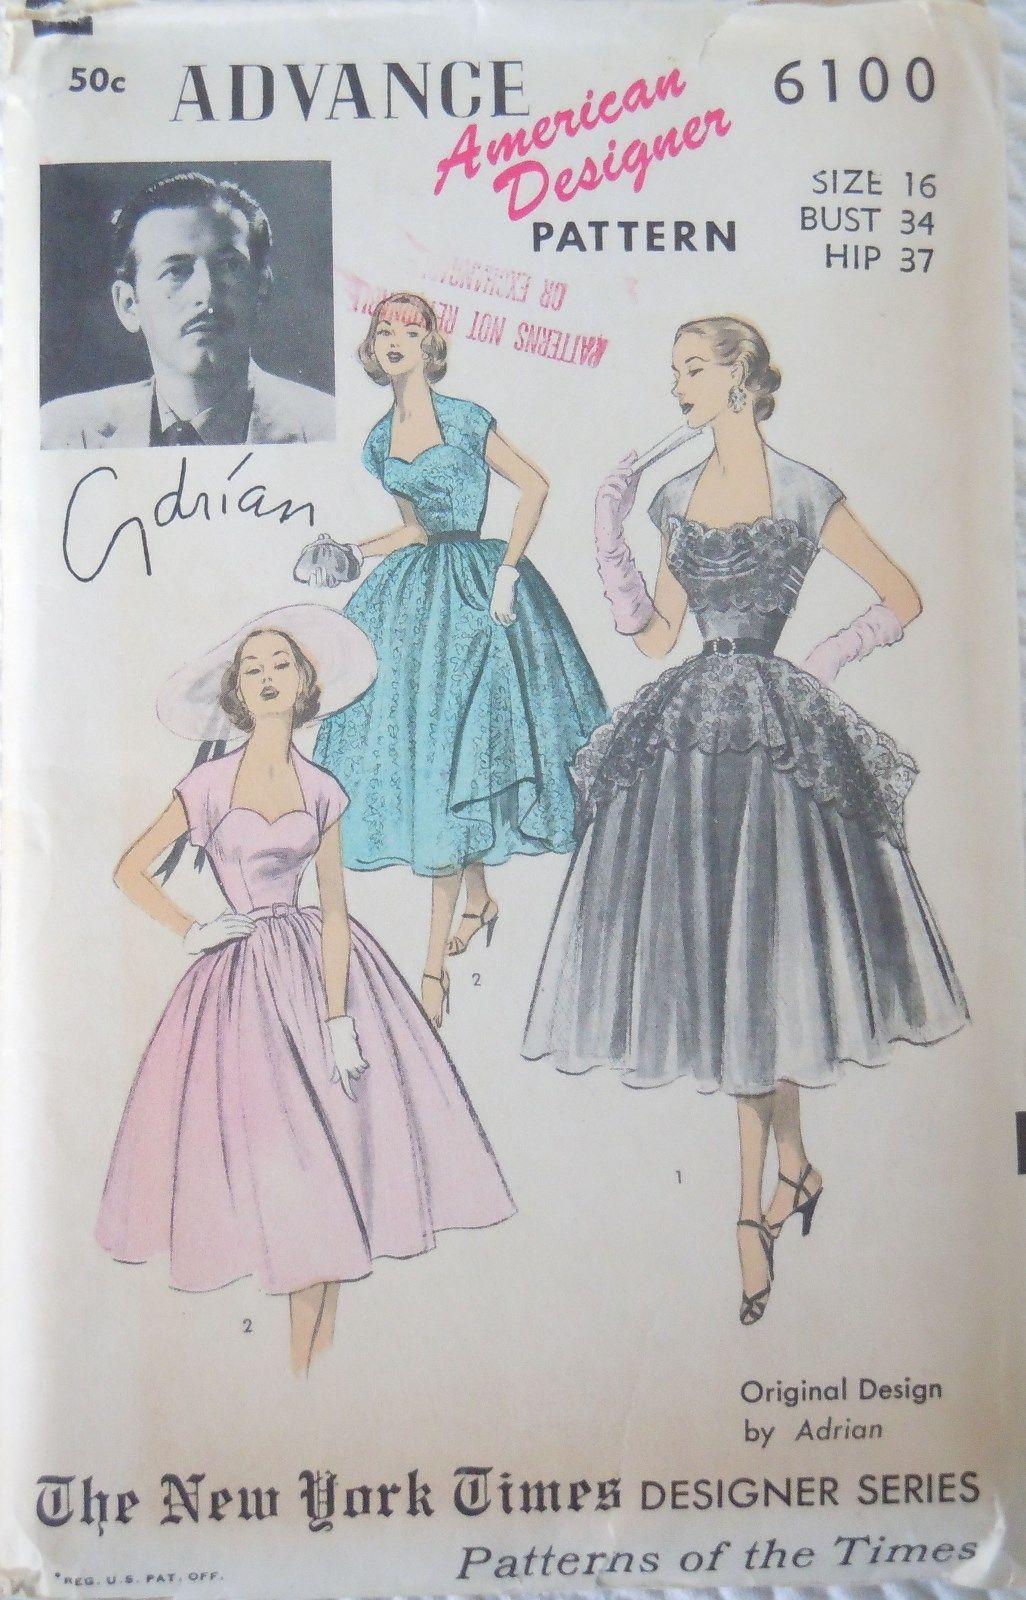 1bc9737e6fa9c RARE 1950 s Advance Pattern 6100 Designer Adrian Peplum Dress Factory  Folded